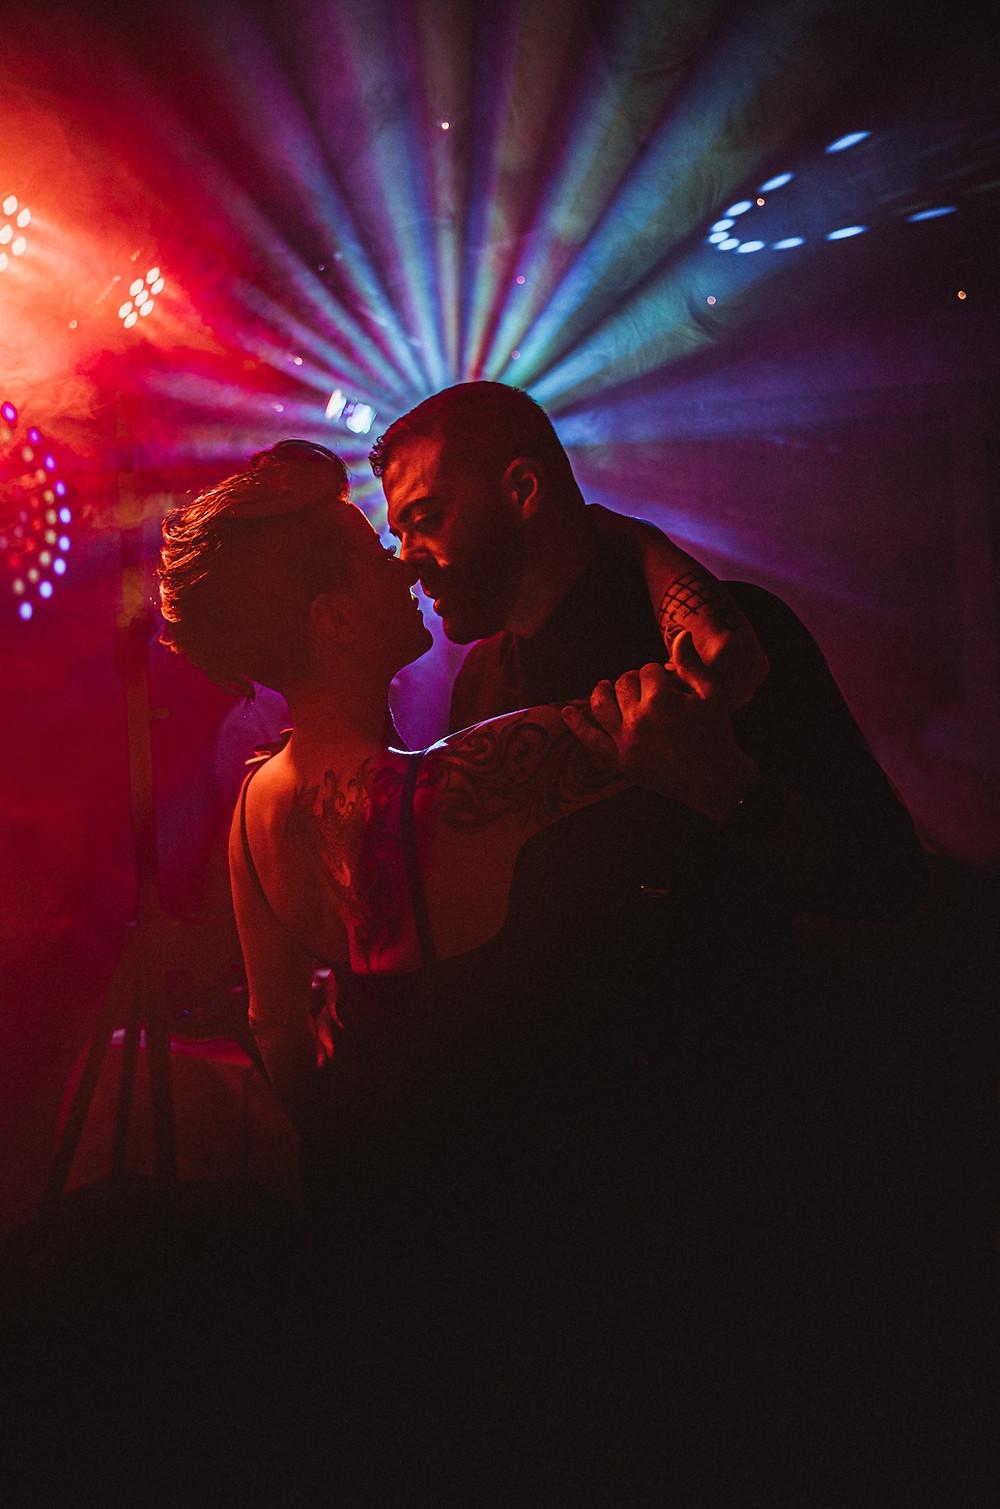 premiere danse mariage couple photographe mariage suisse golf club gruyere spot lumiere ombre emotion tendresse sensualite